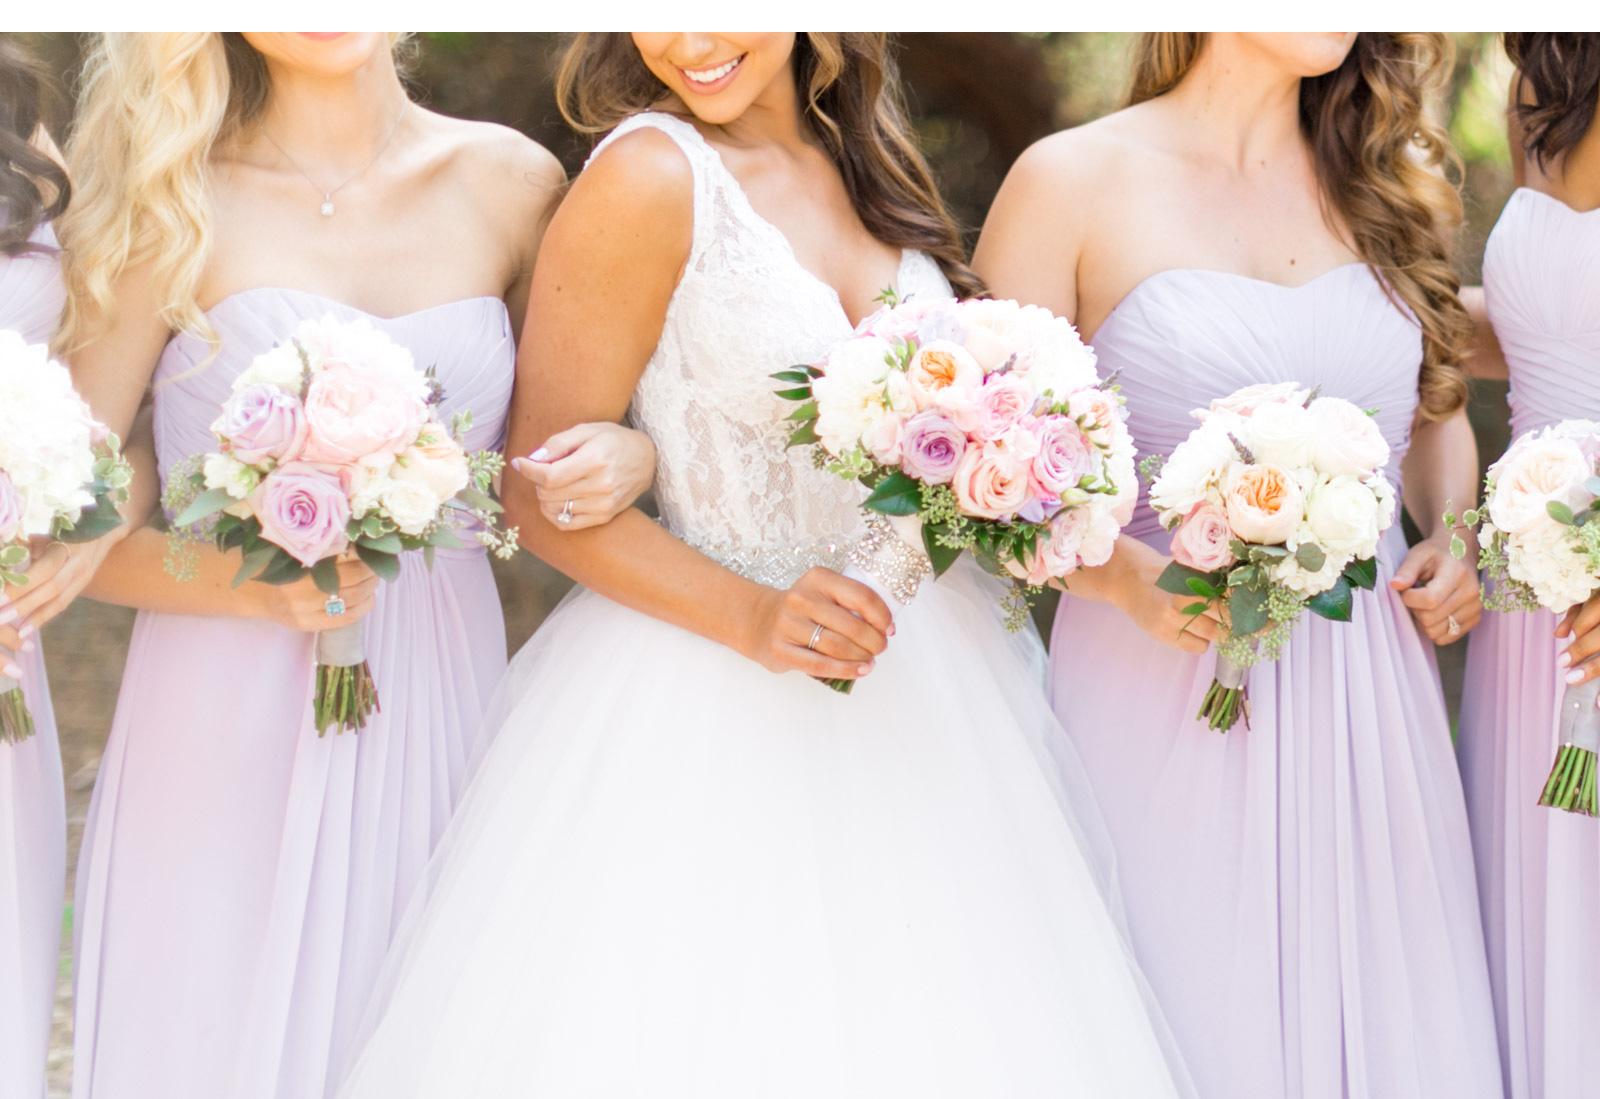 Miss-USA-Temecula-Wedding-Natalie-Schutt-Photography_04.jpg